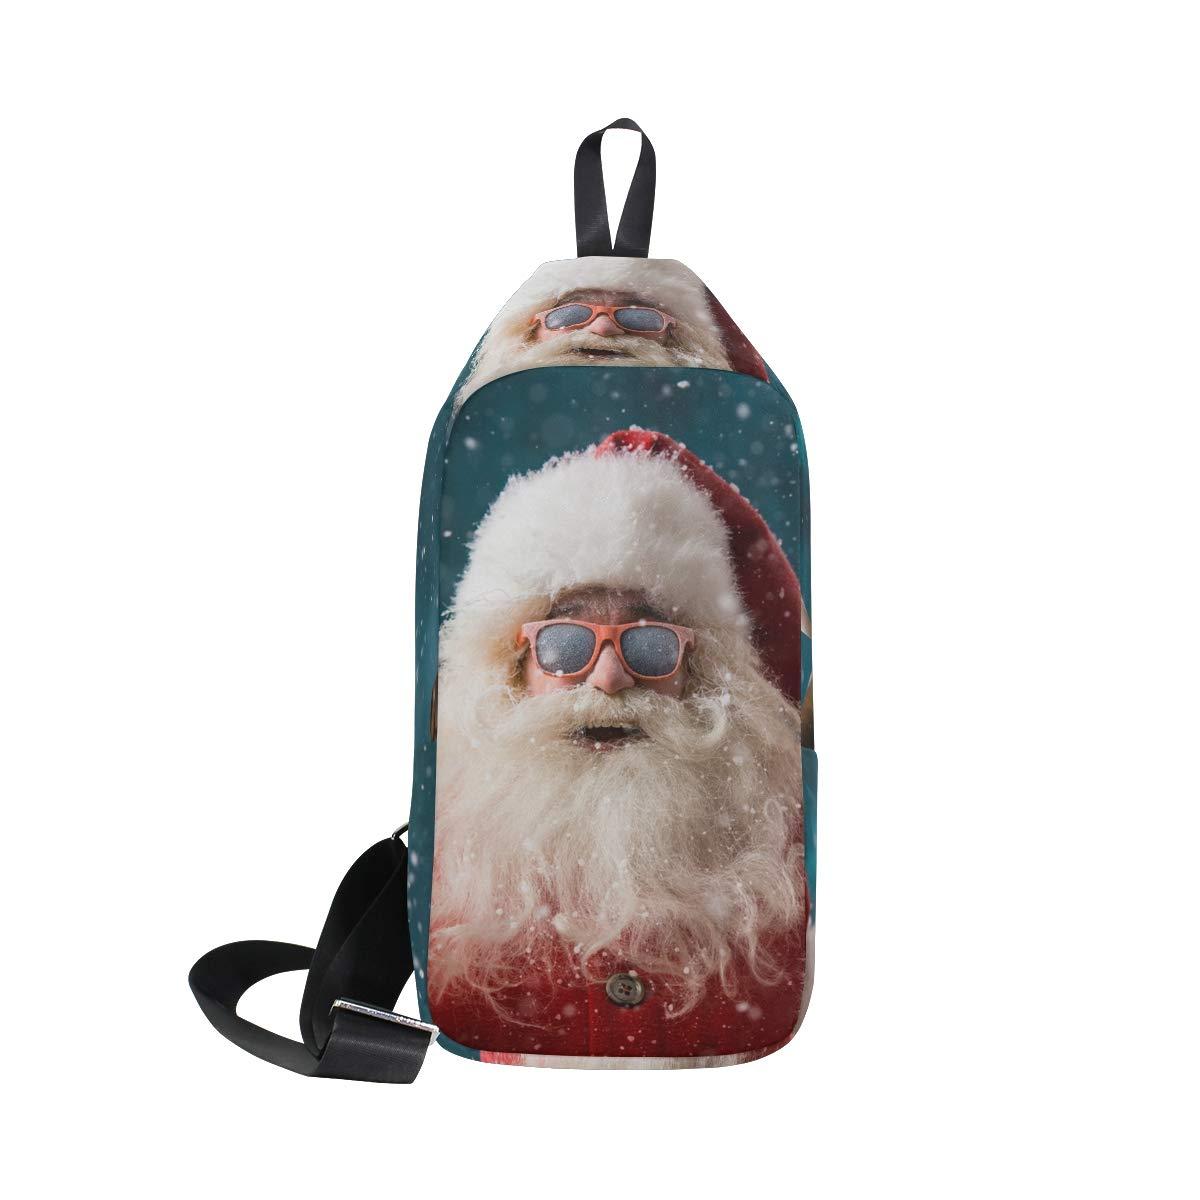 5b8e8525cd2b Amazon.com | IMOBABY Winter Holiday Chriestmas Santa Claus Sling ...